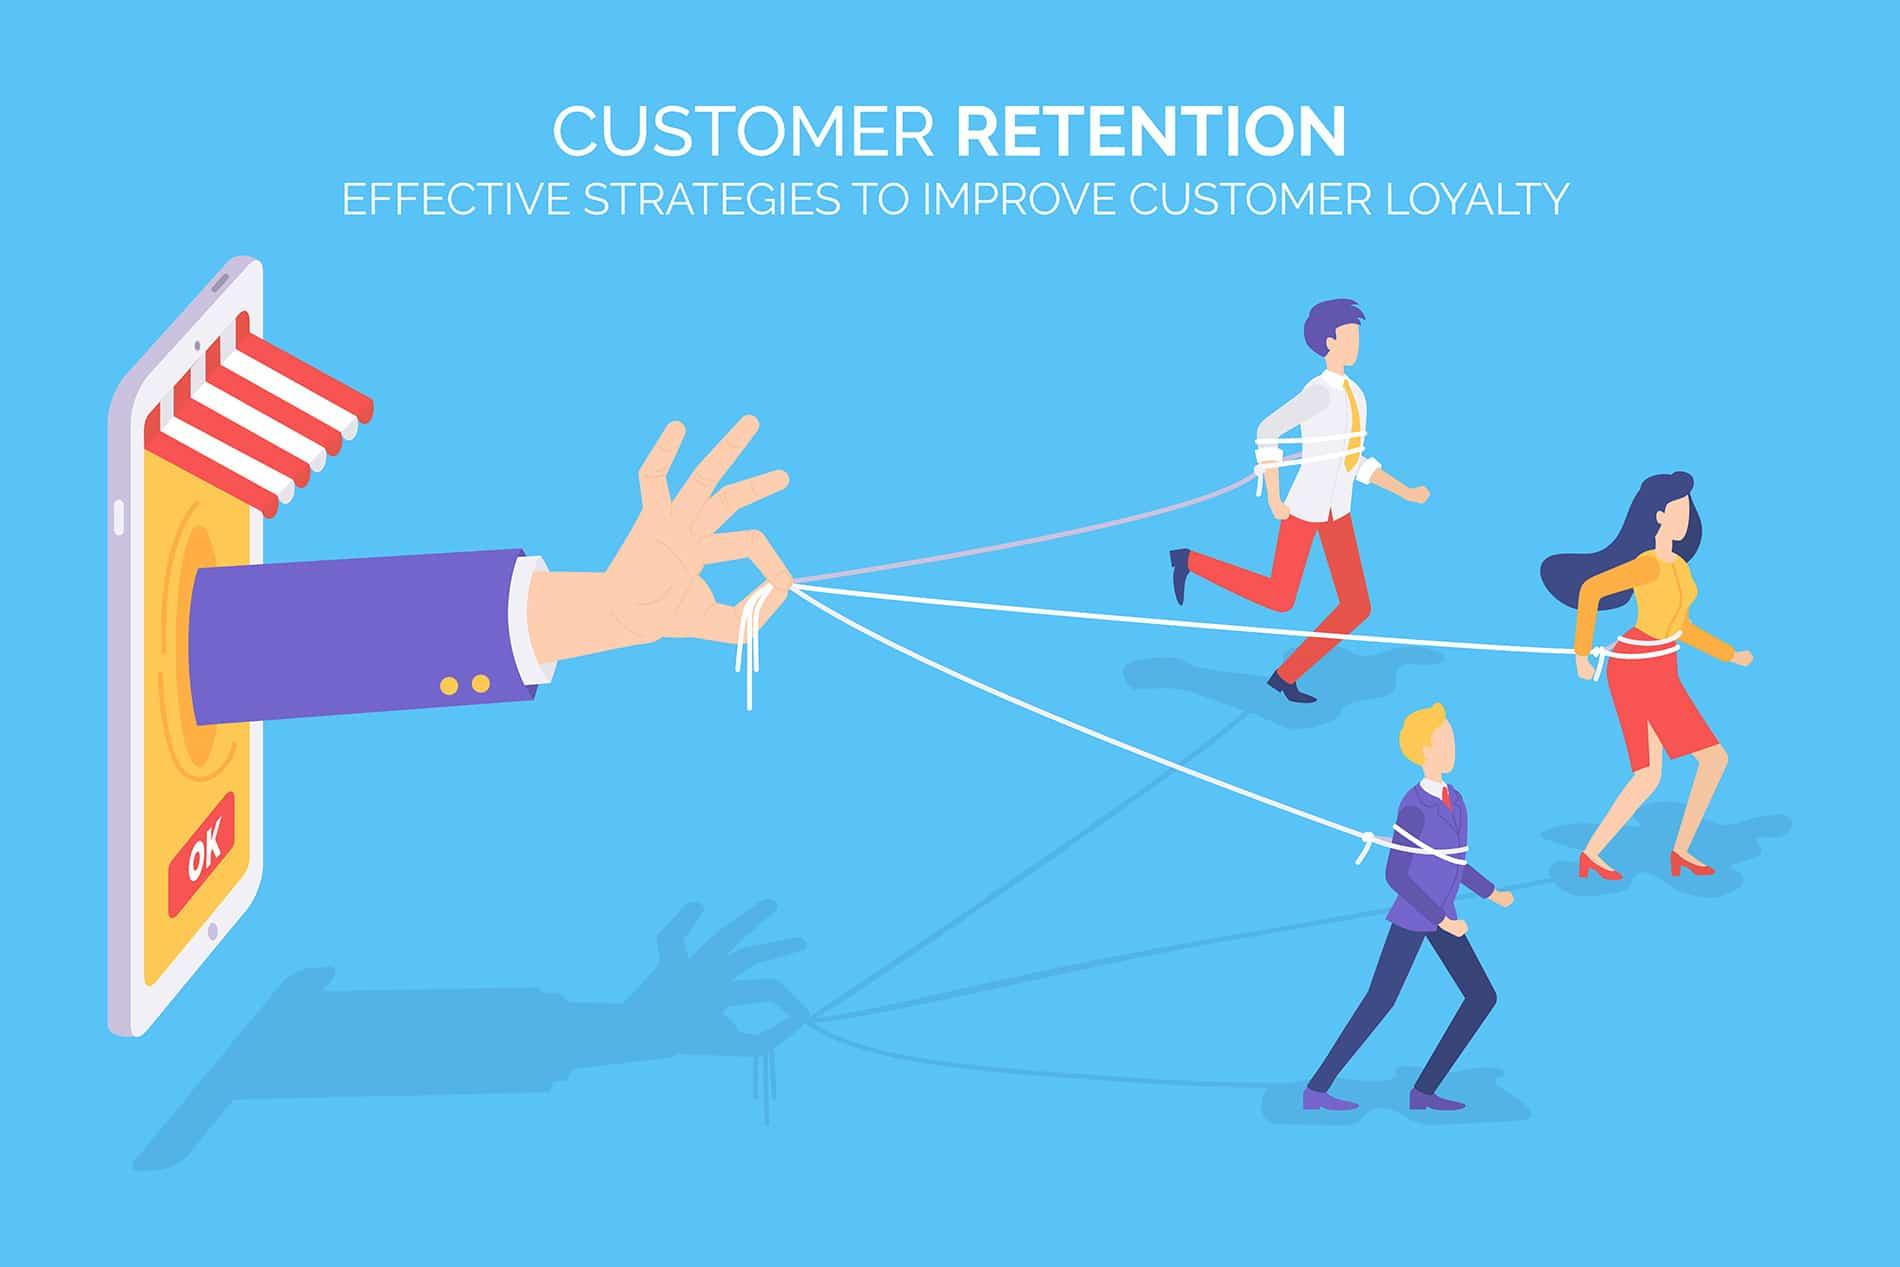 Strategies to improve customer loyalty